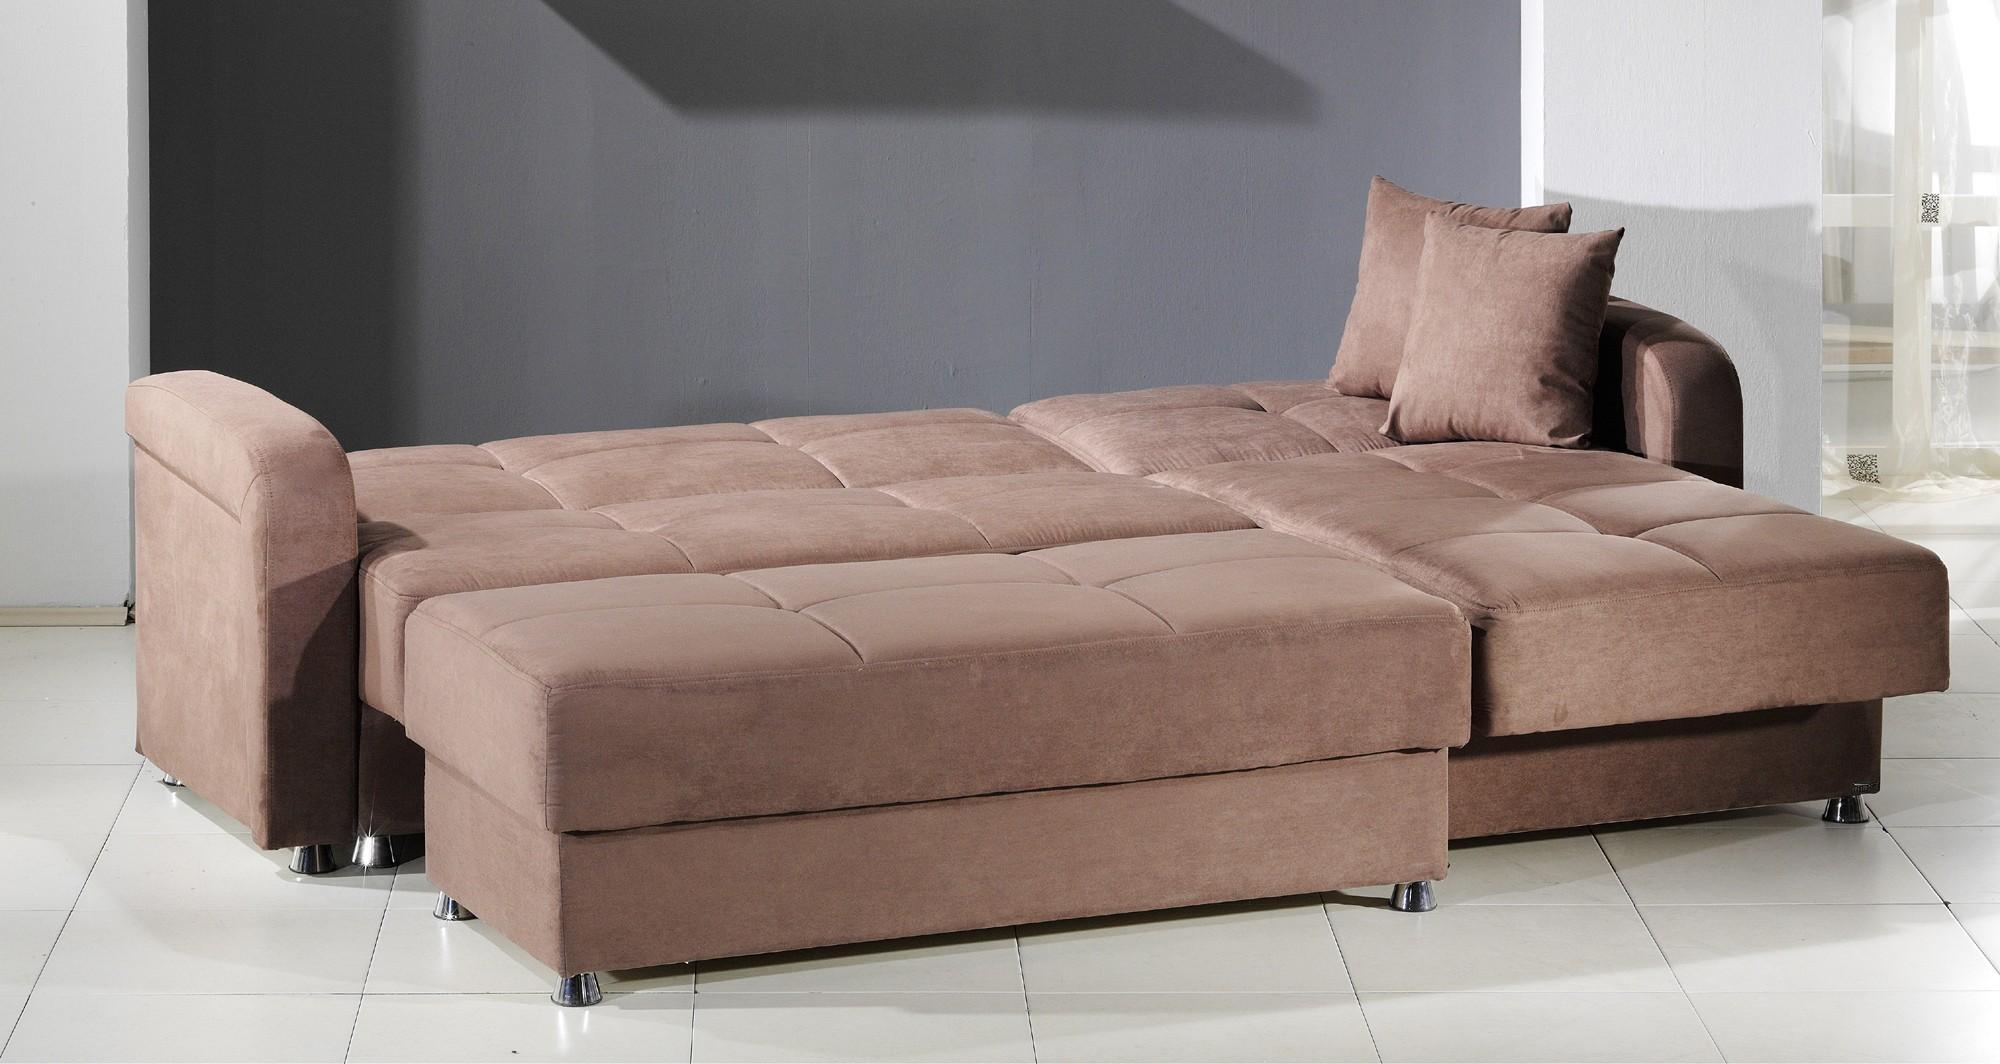 Wonderful Sleeper Sectional Sofa With Chaise Latest Cheap With Sleeper Sectional Sofas (View 11 of 20)